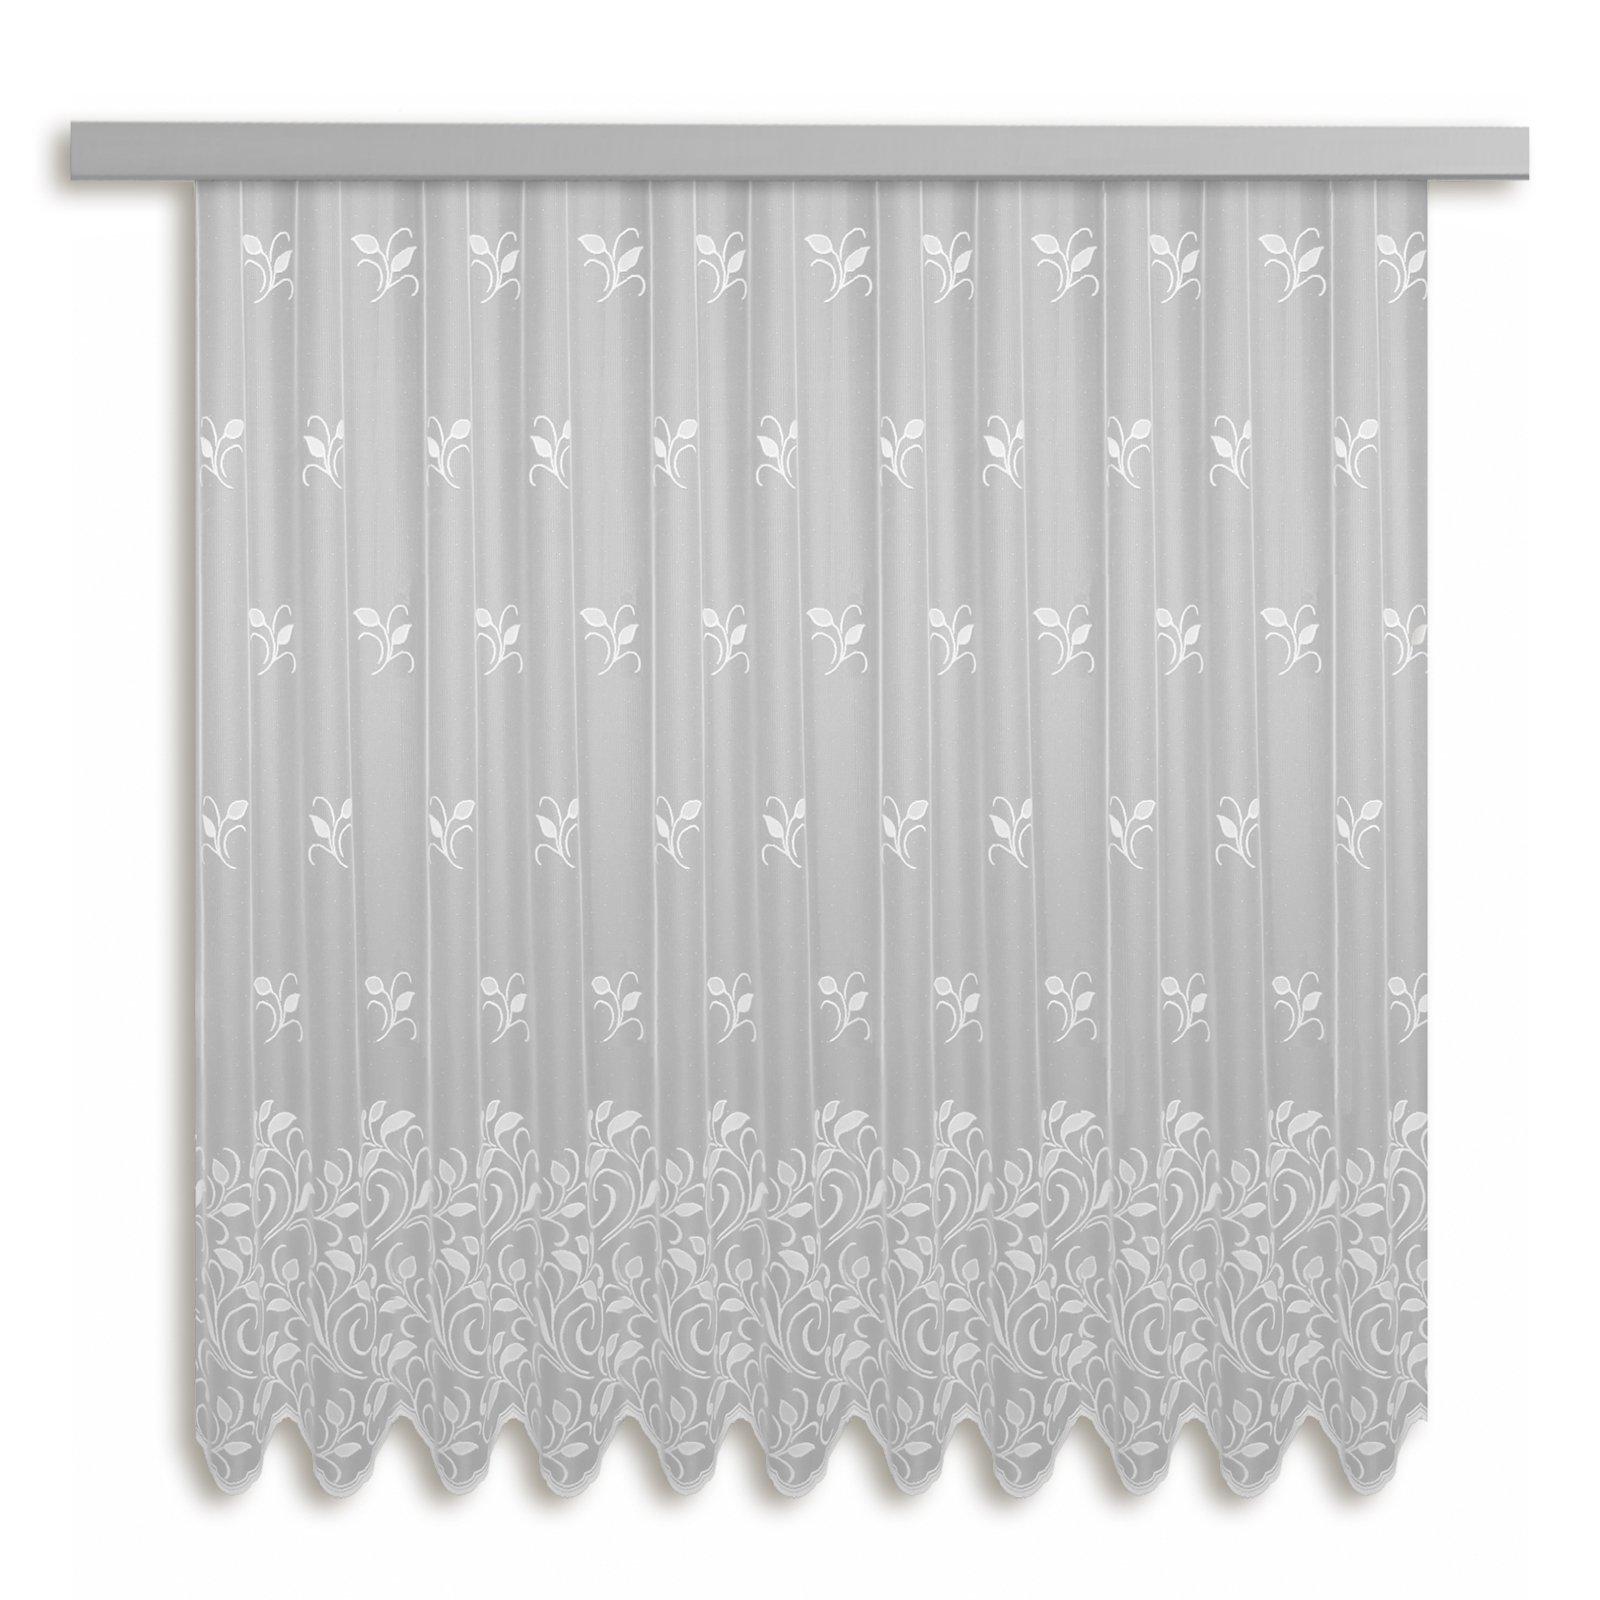 gardine bologna jacquard bogenstore wei 300x175 cm transparente gardinen gardinen. Black Bedroom Furniture Sets. Home Design Ideas